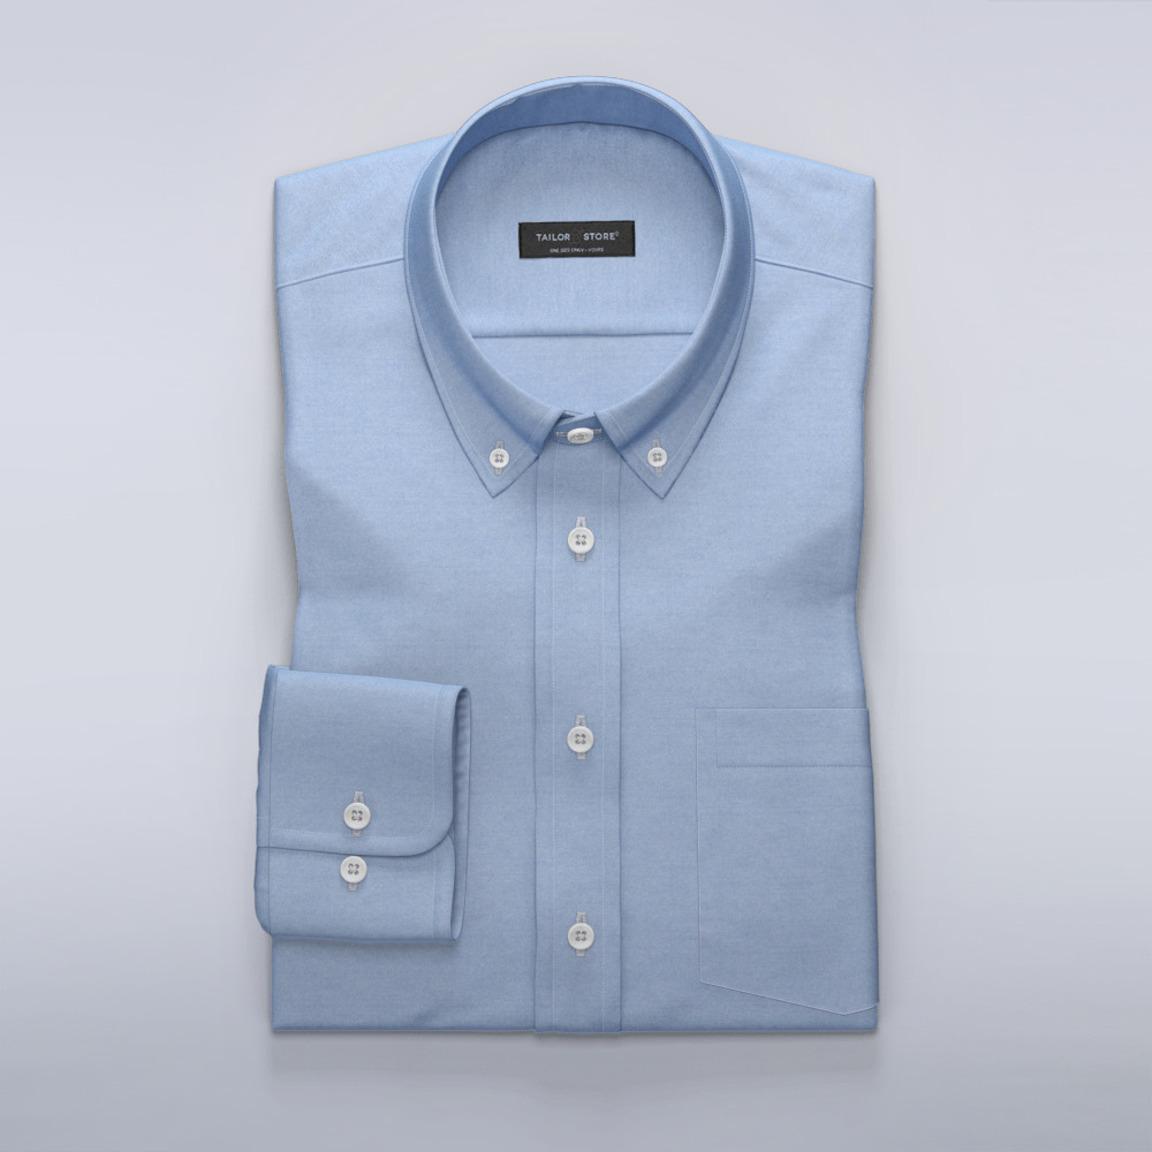 Blå skjorte i pinpoint Oxford